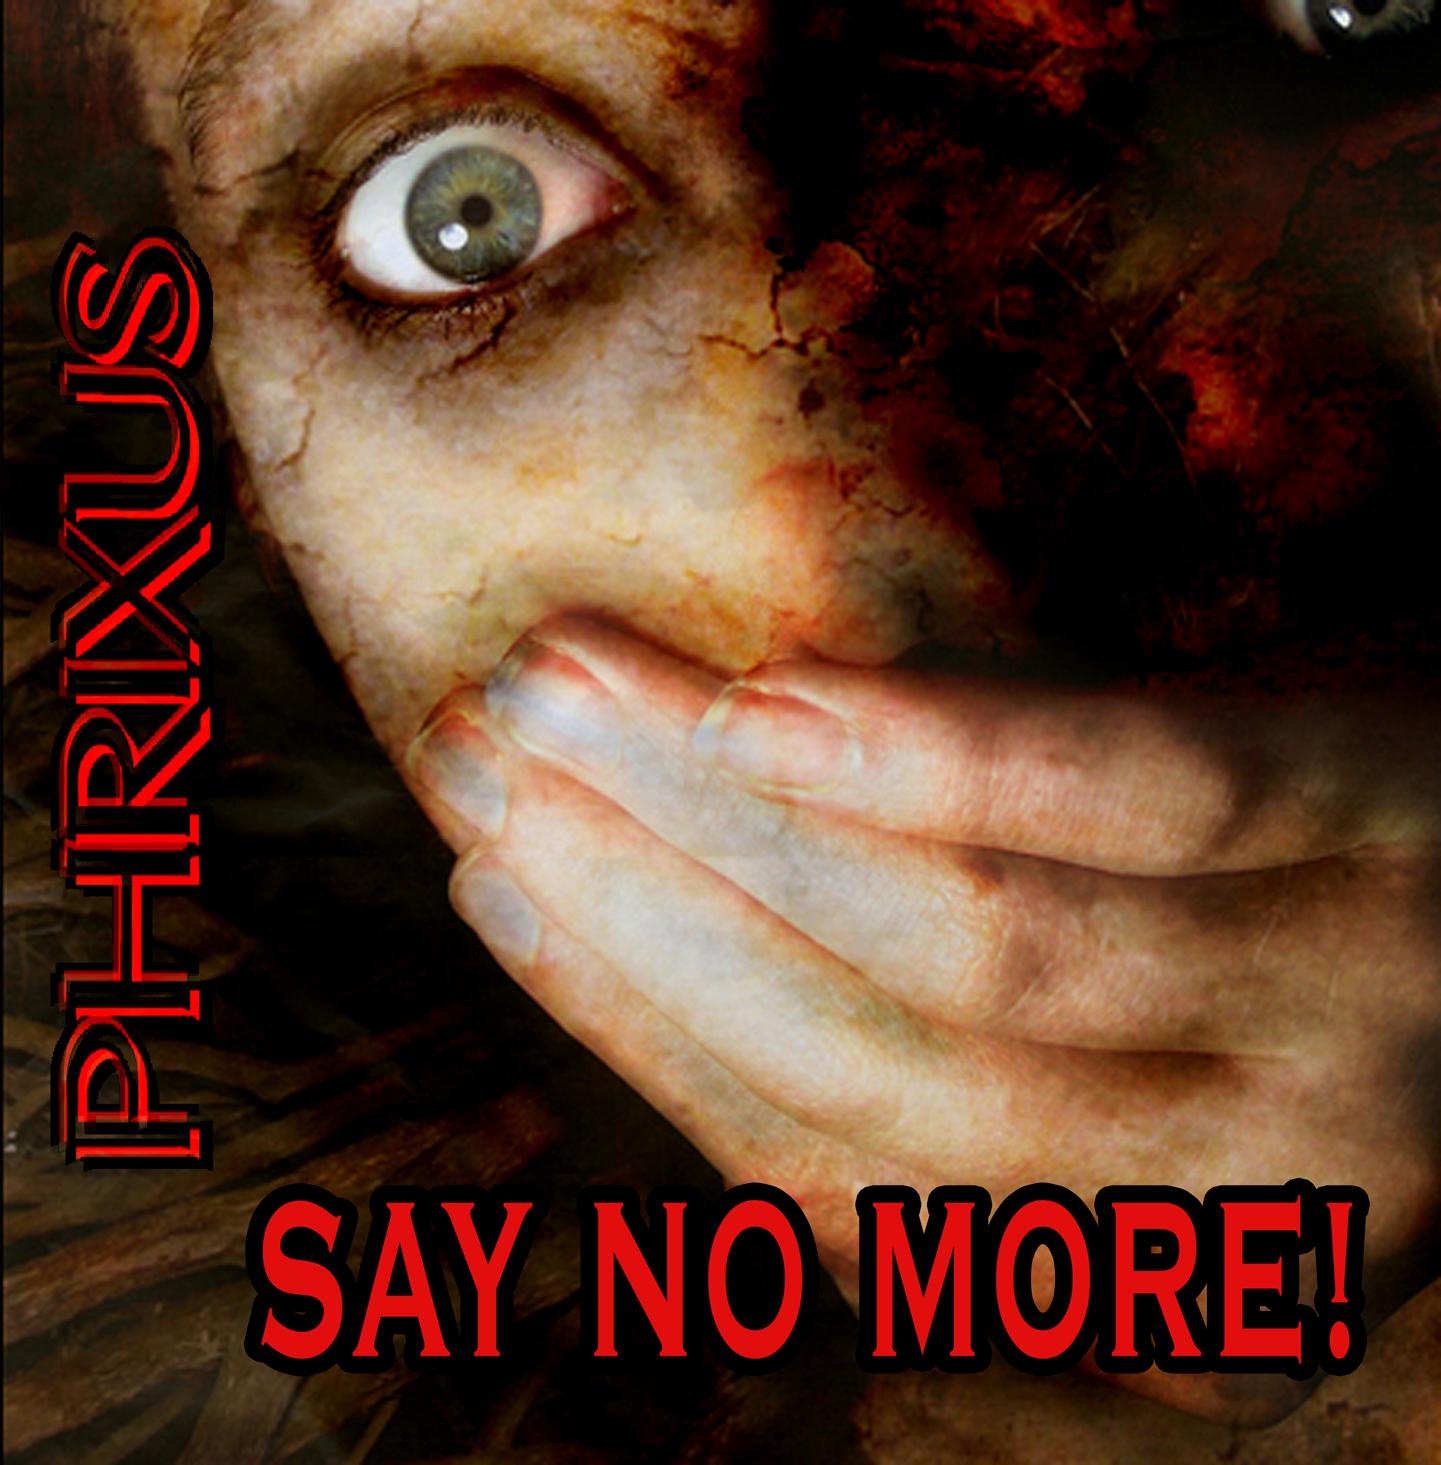 Cover van de CD Say No More van de band Phrixus!